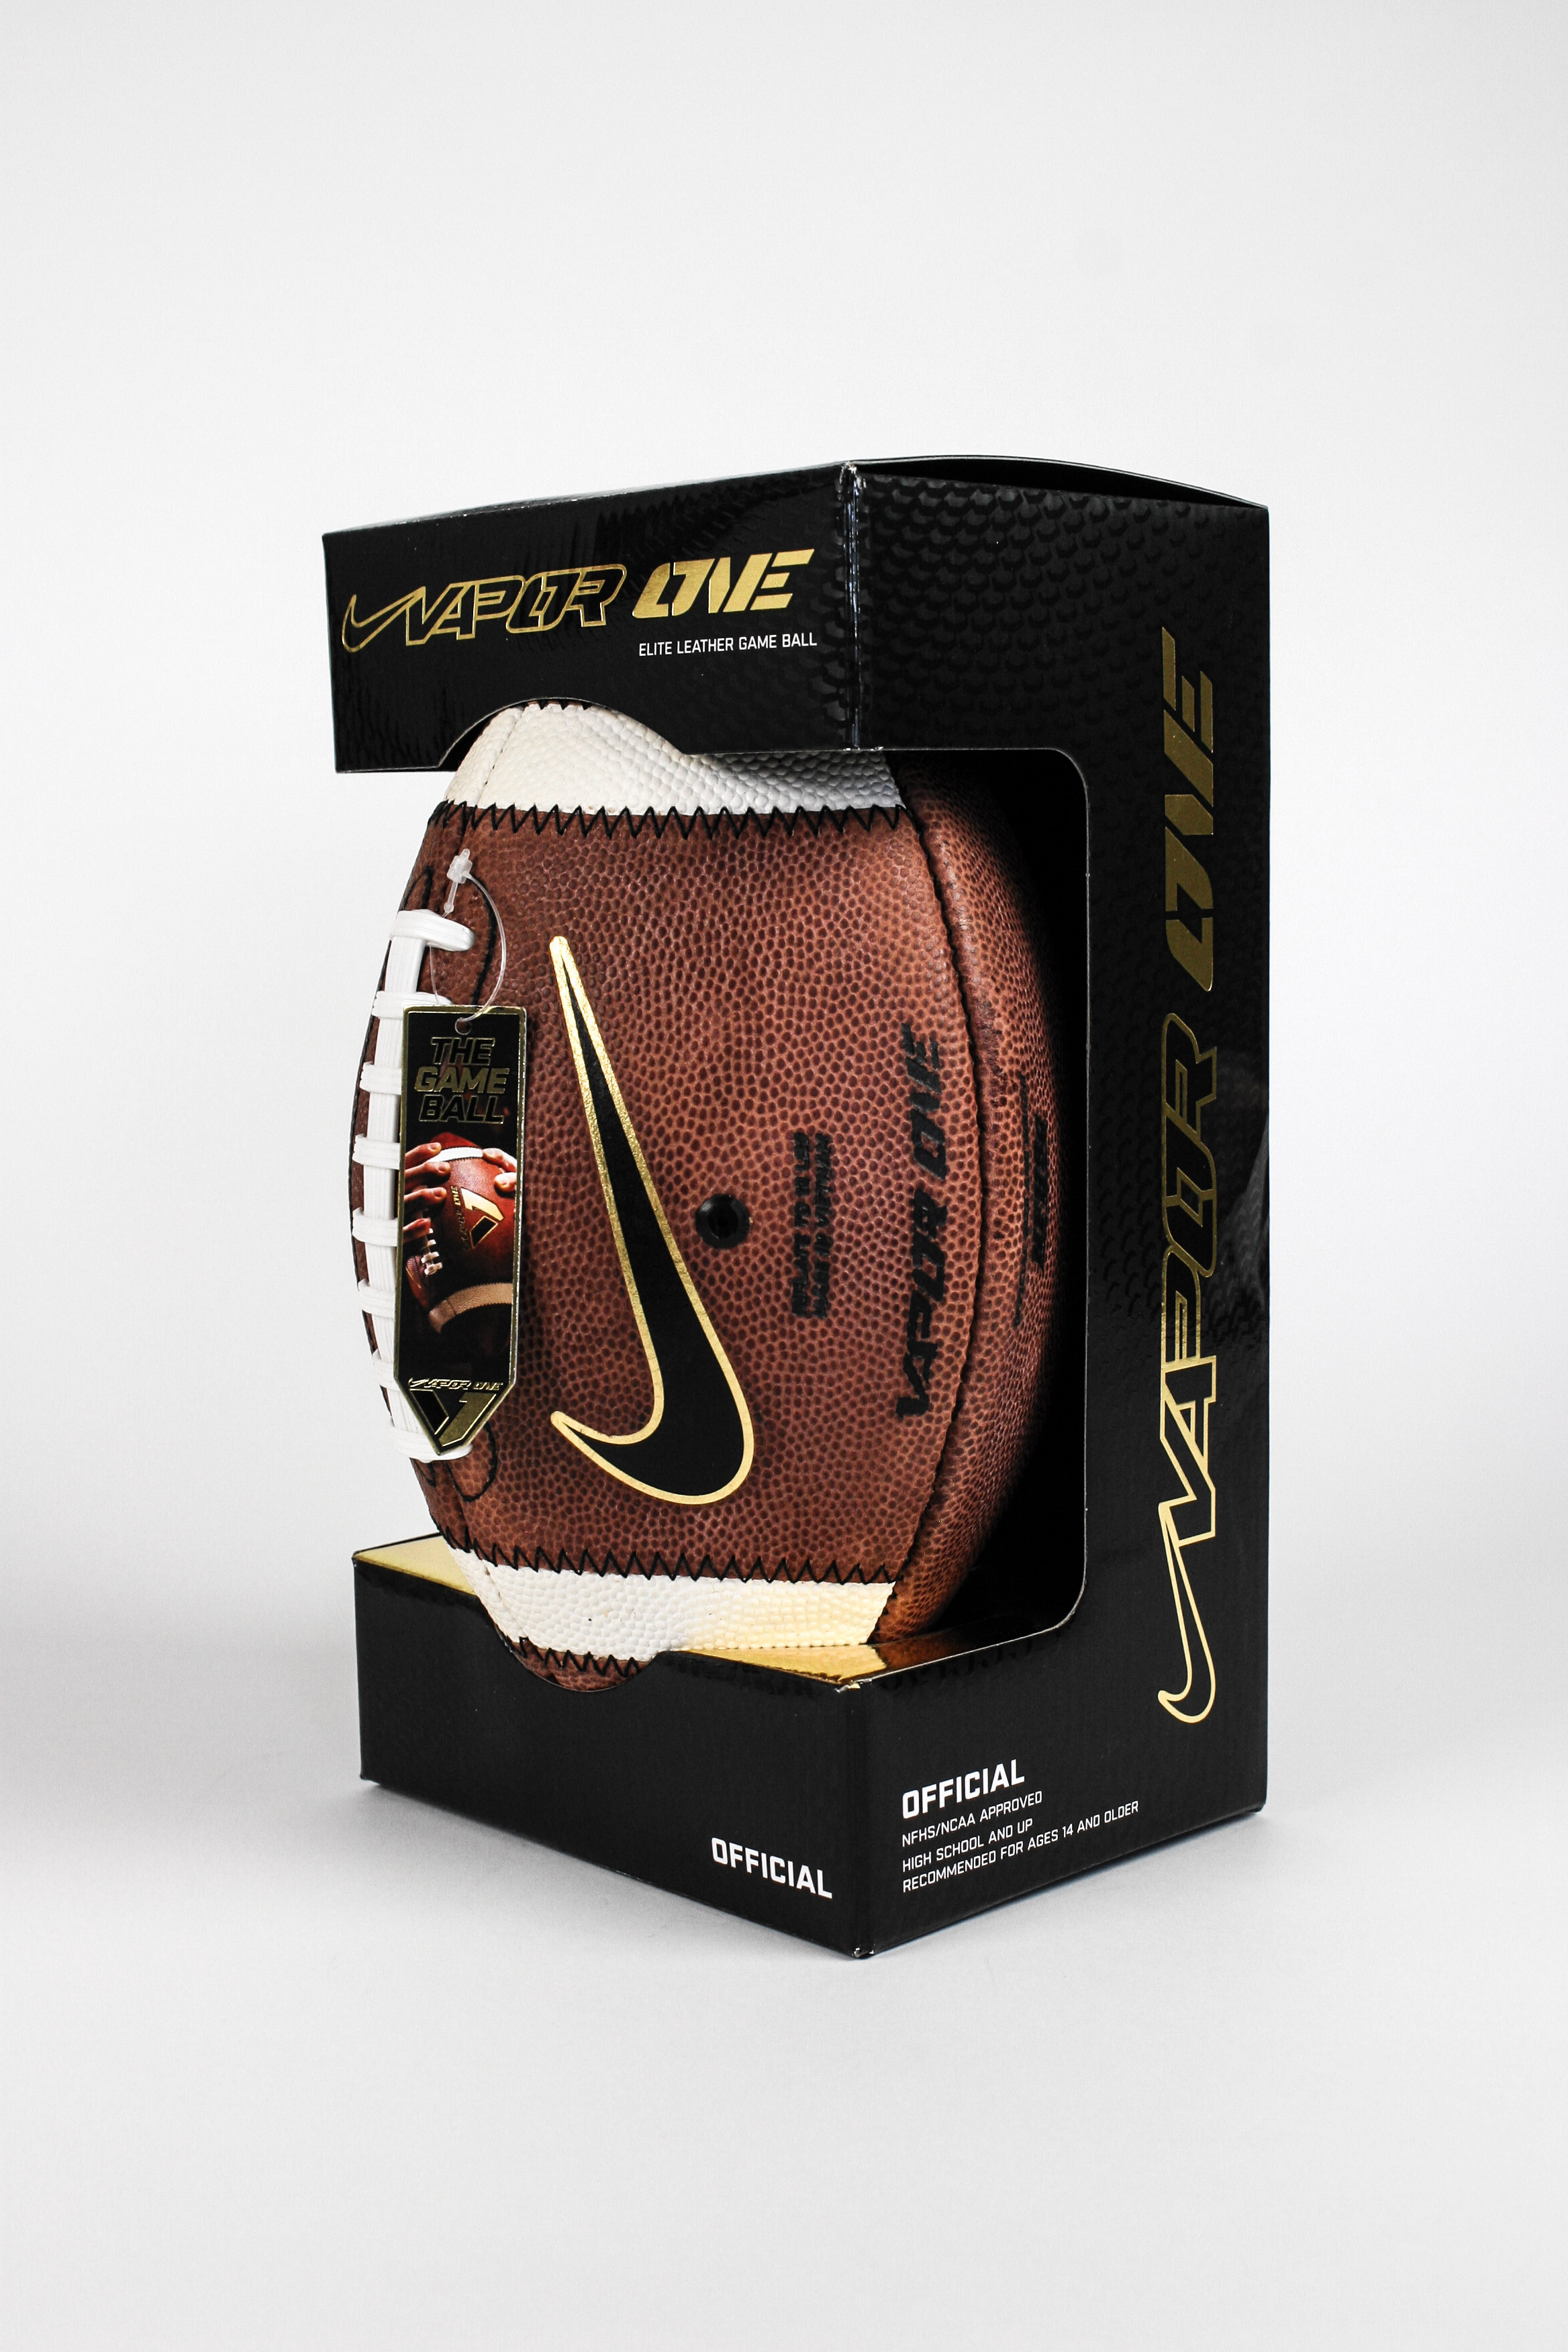 Nike Vapor One—Identity \u0026 Packaging